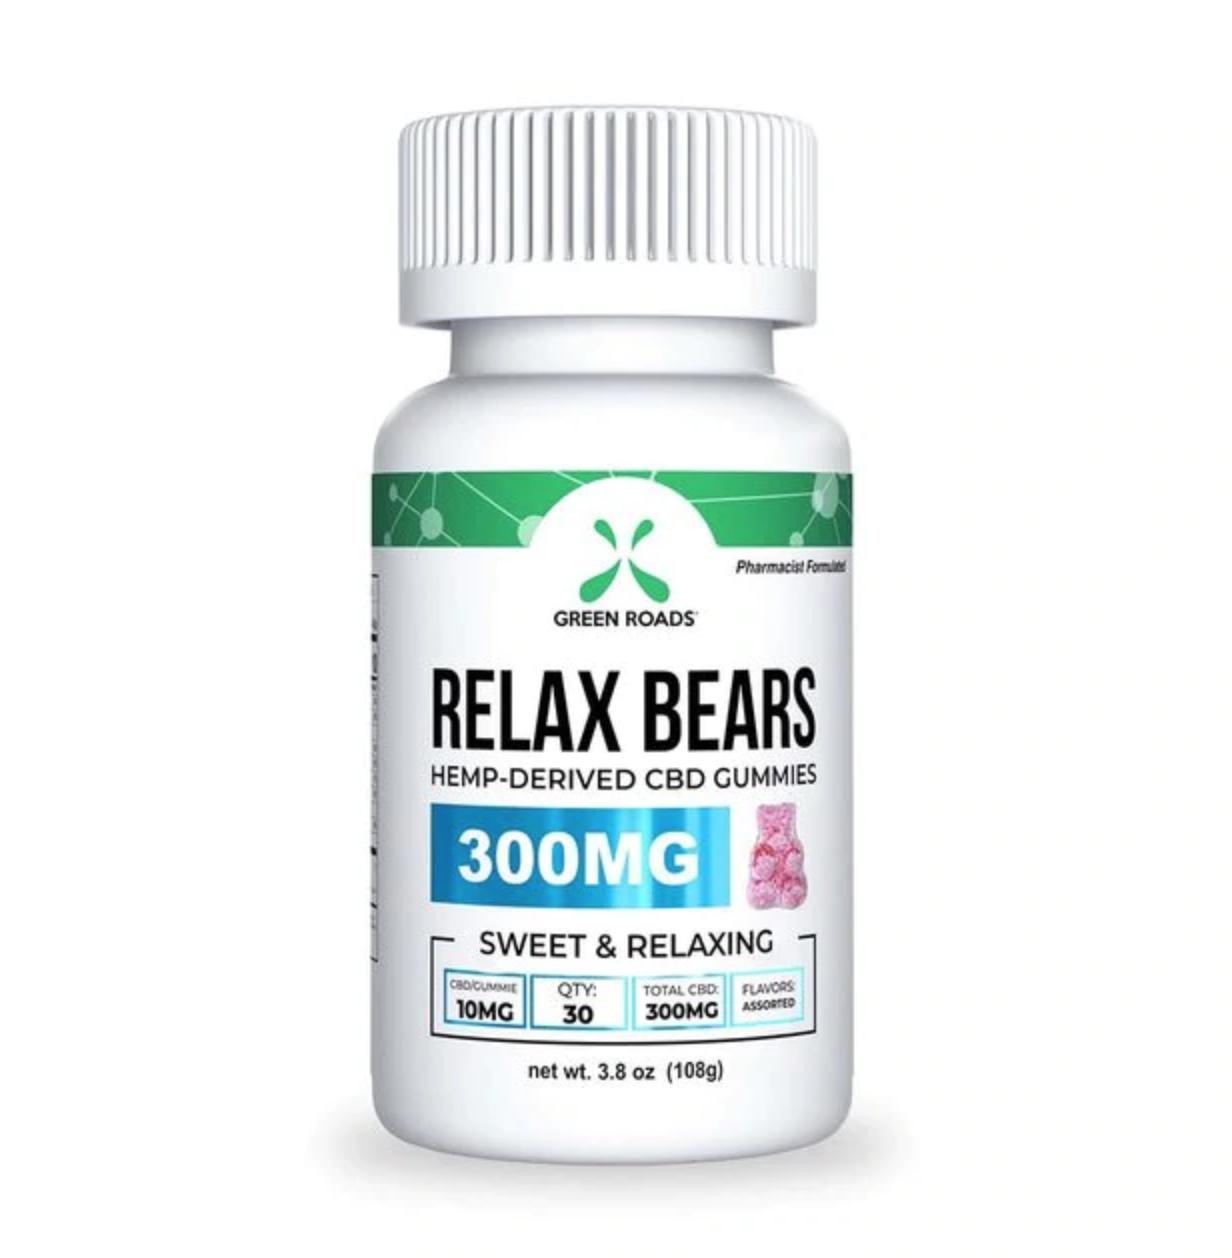 Green Roads Relax Bears 300MG